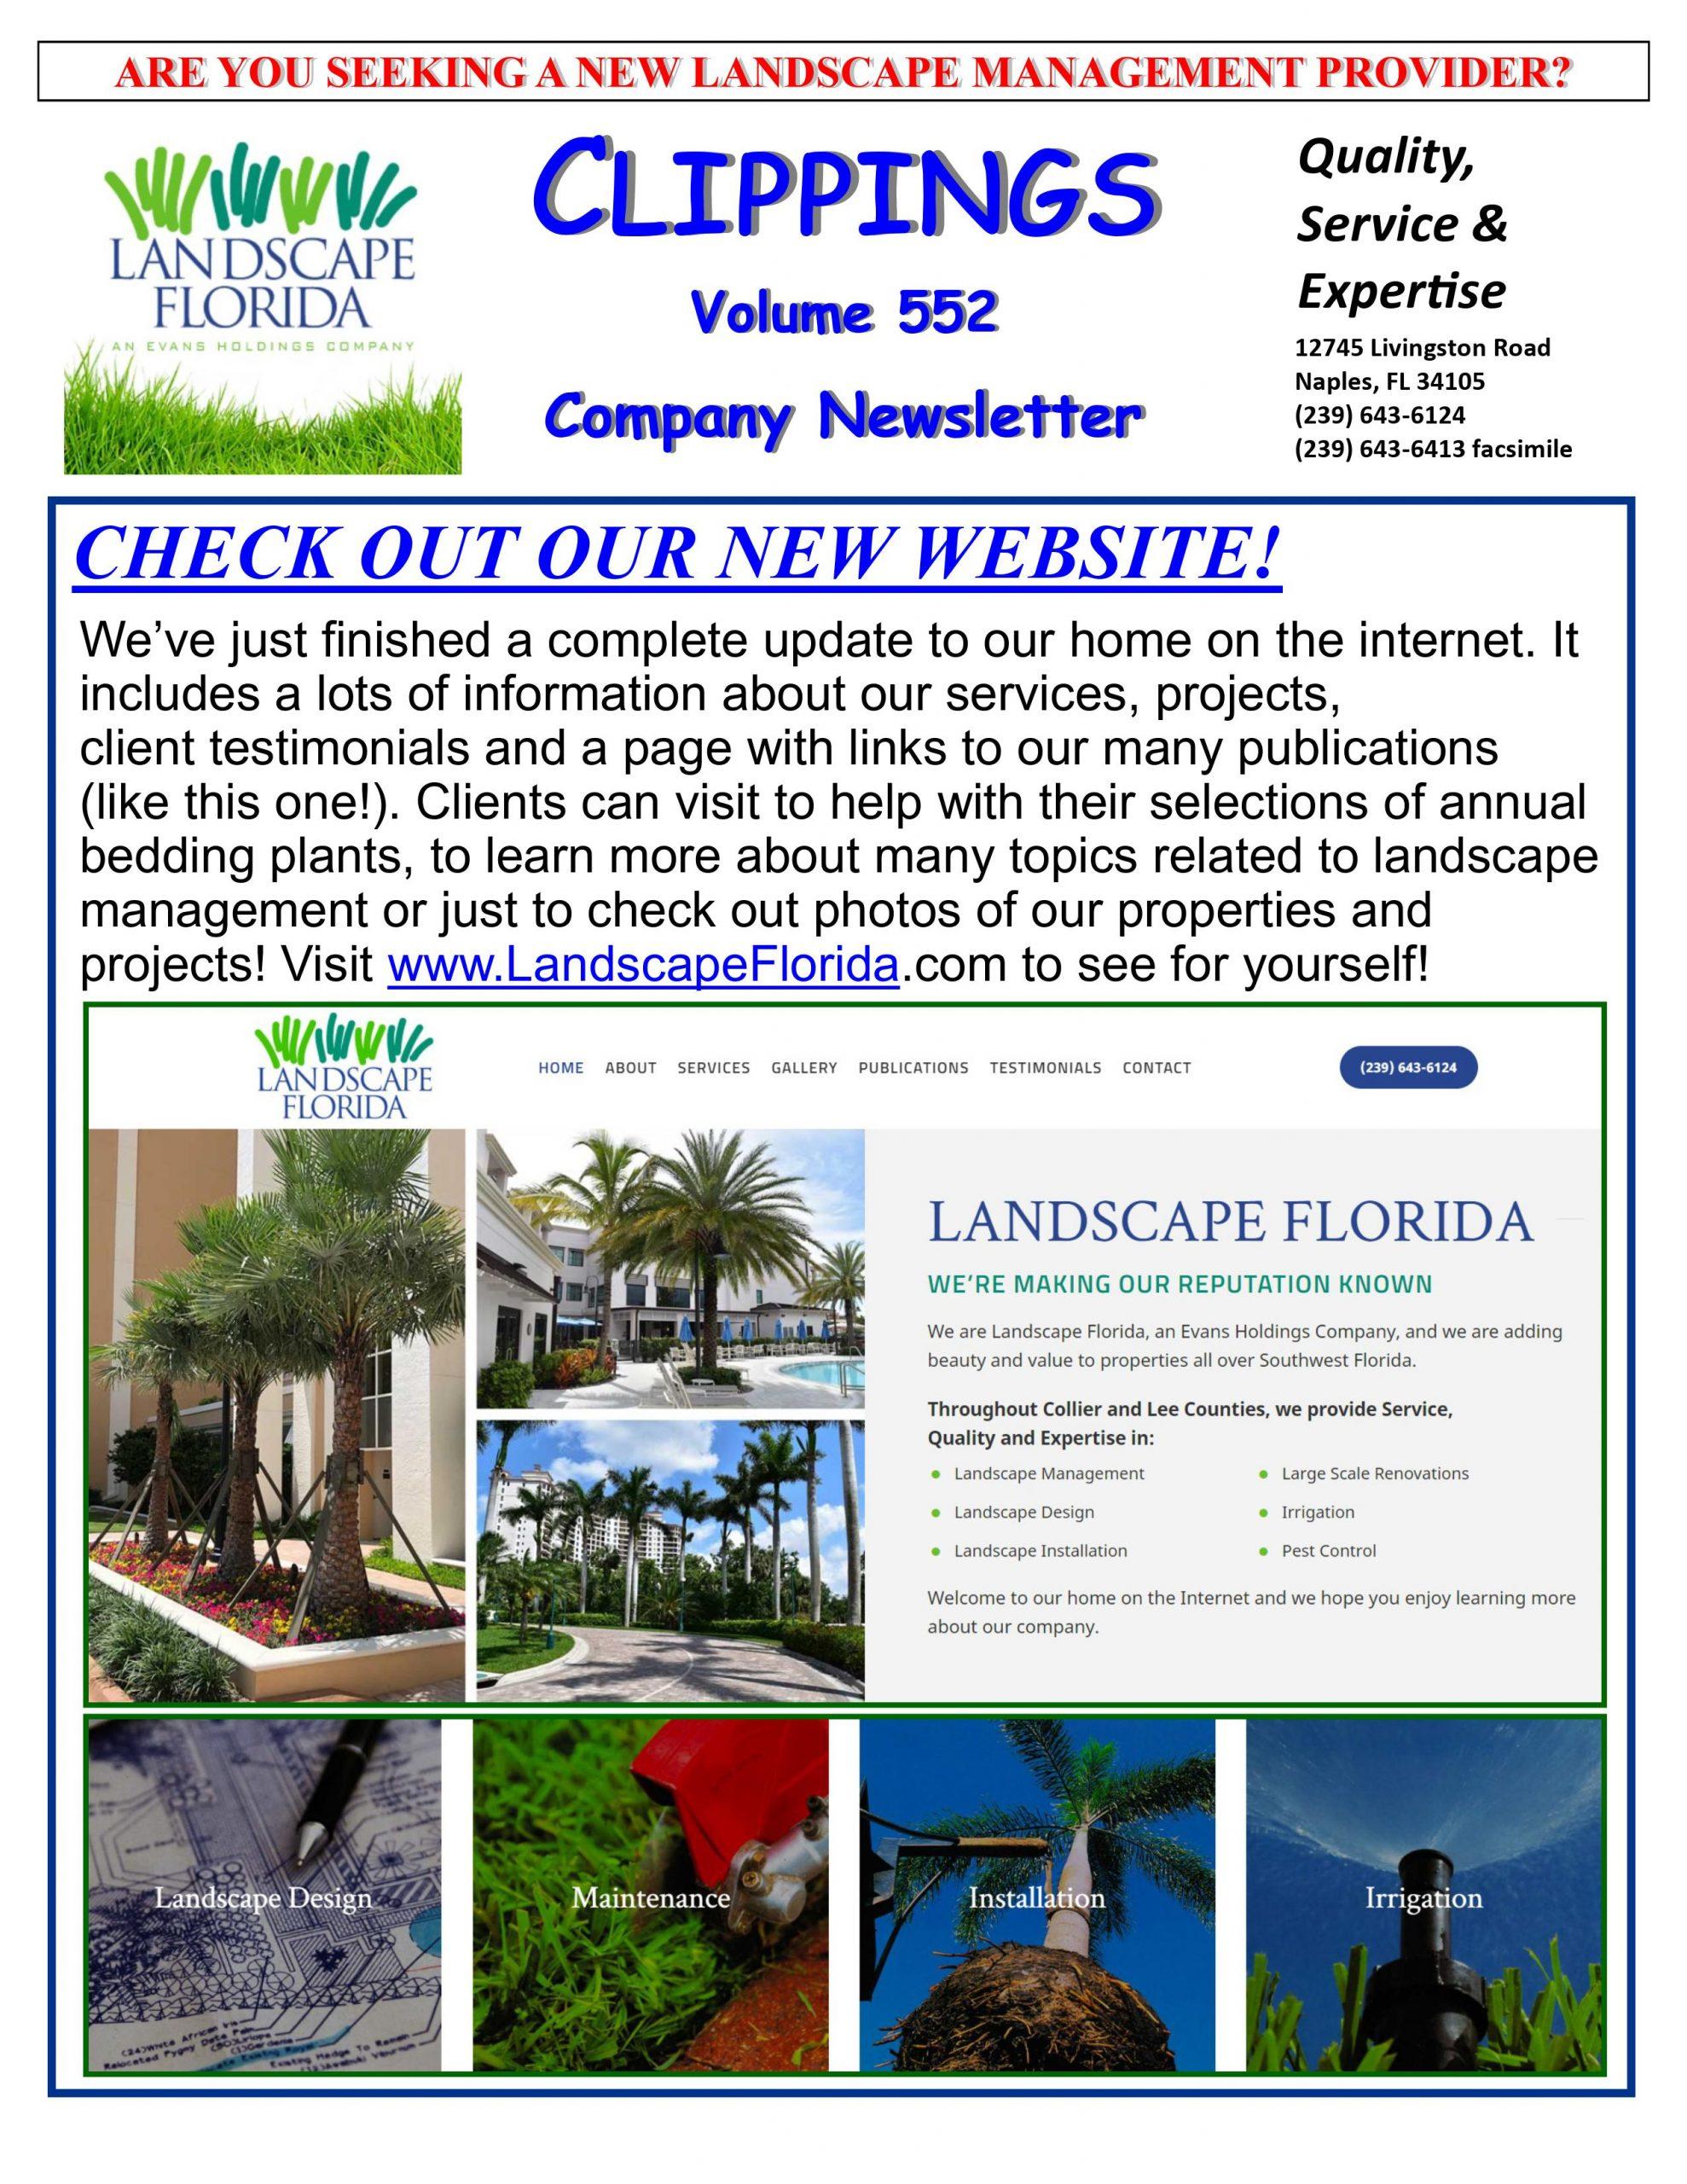 Landscape Florida Publication Clippings Volume 552 Company Newsletter | Southwest Florida Landscape Design and Maintenance